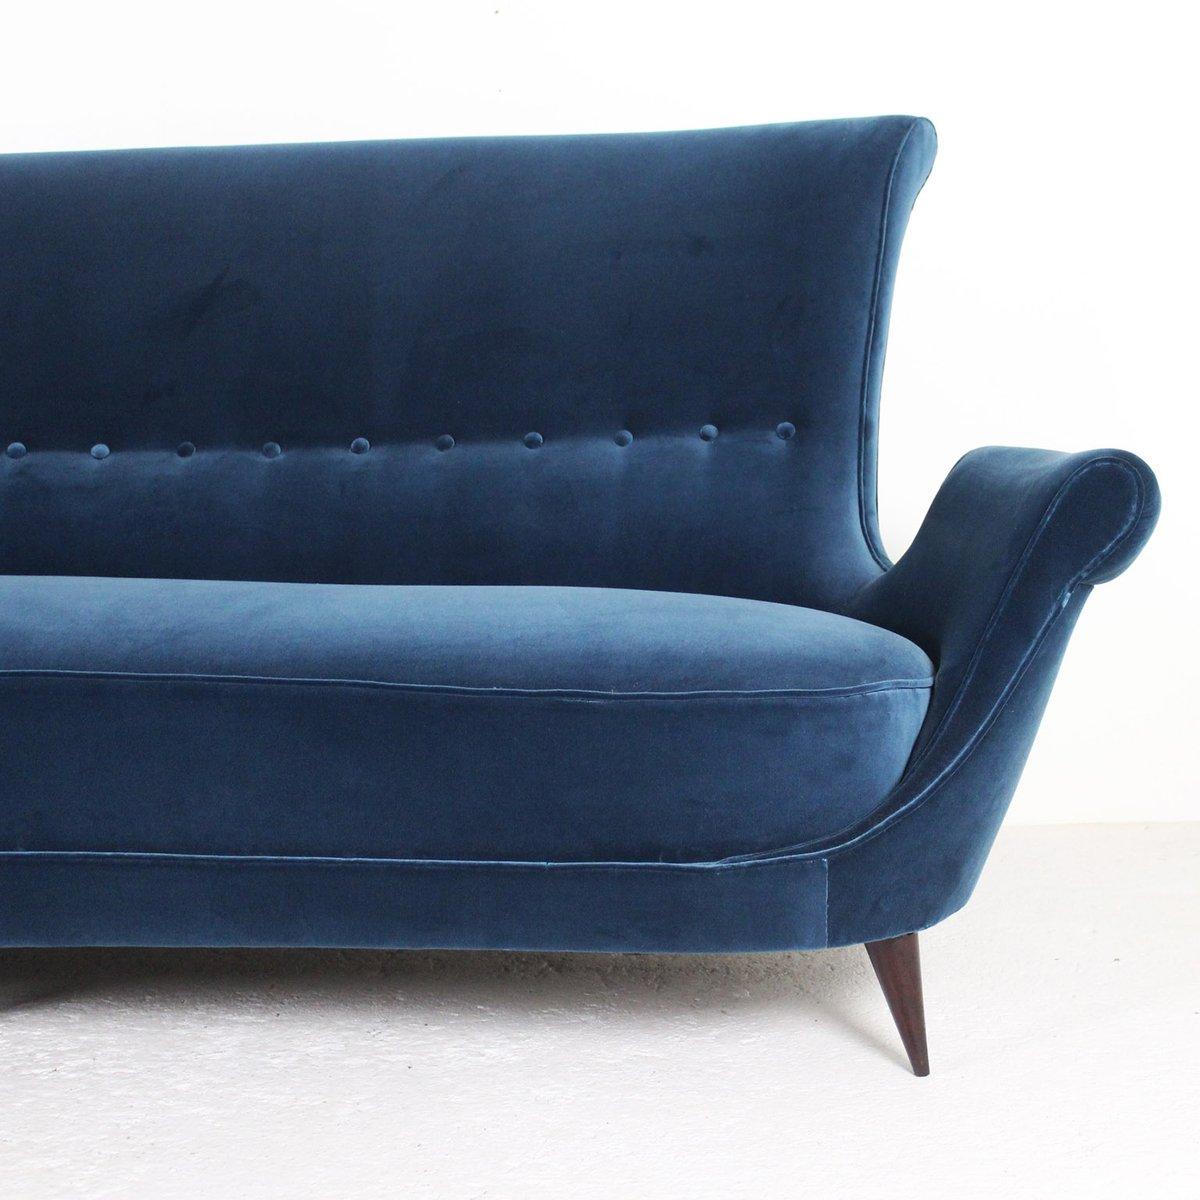 Velour Sofa blue velour sofa 1950s for sale at pamono